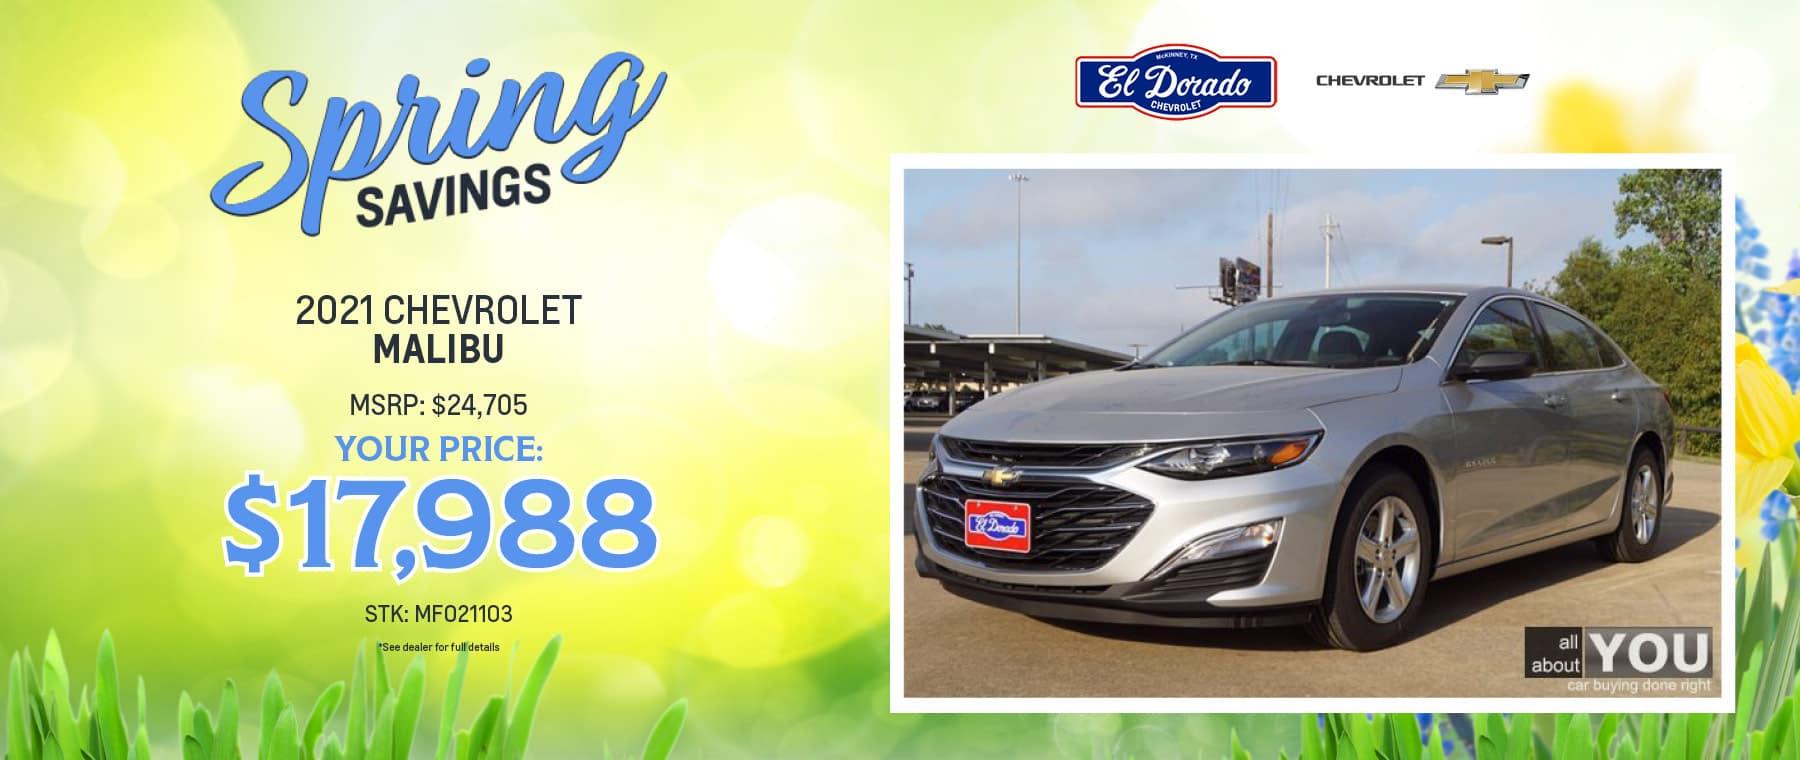 2021 Chevrolet Malibu Offer - El Dorado Chevrolet in McKinney, Texas